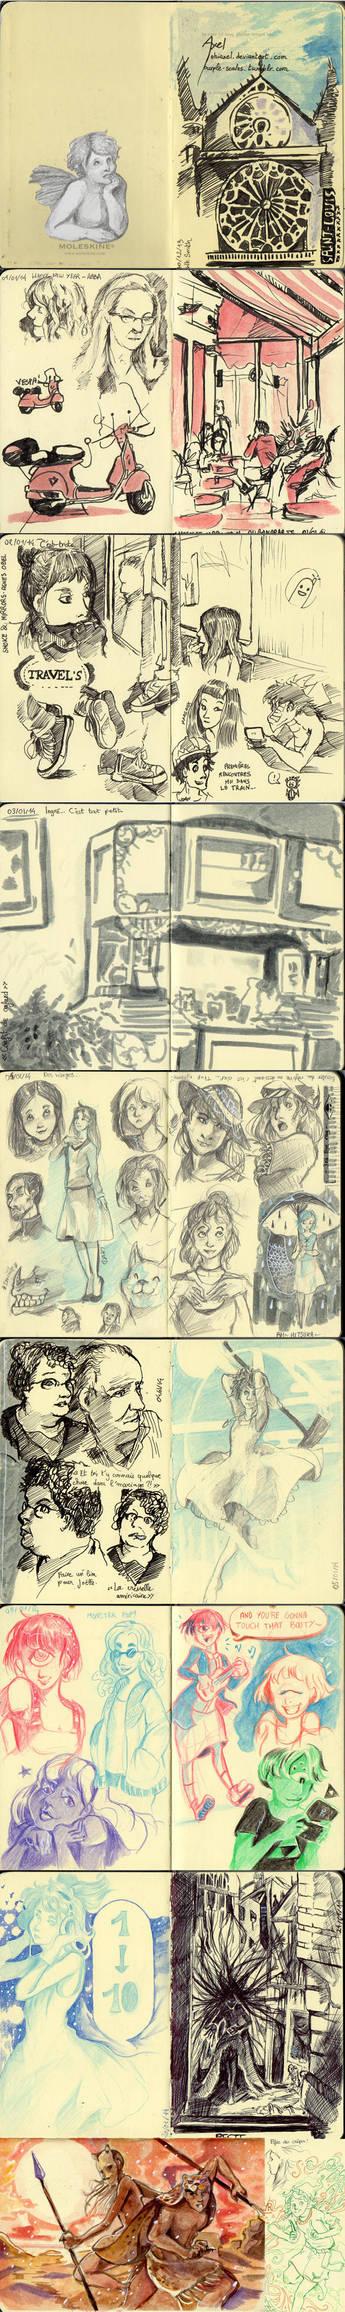 Sketchbook stuff #1 by LohiAxel